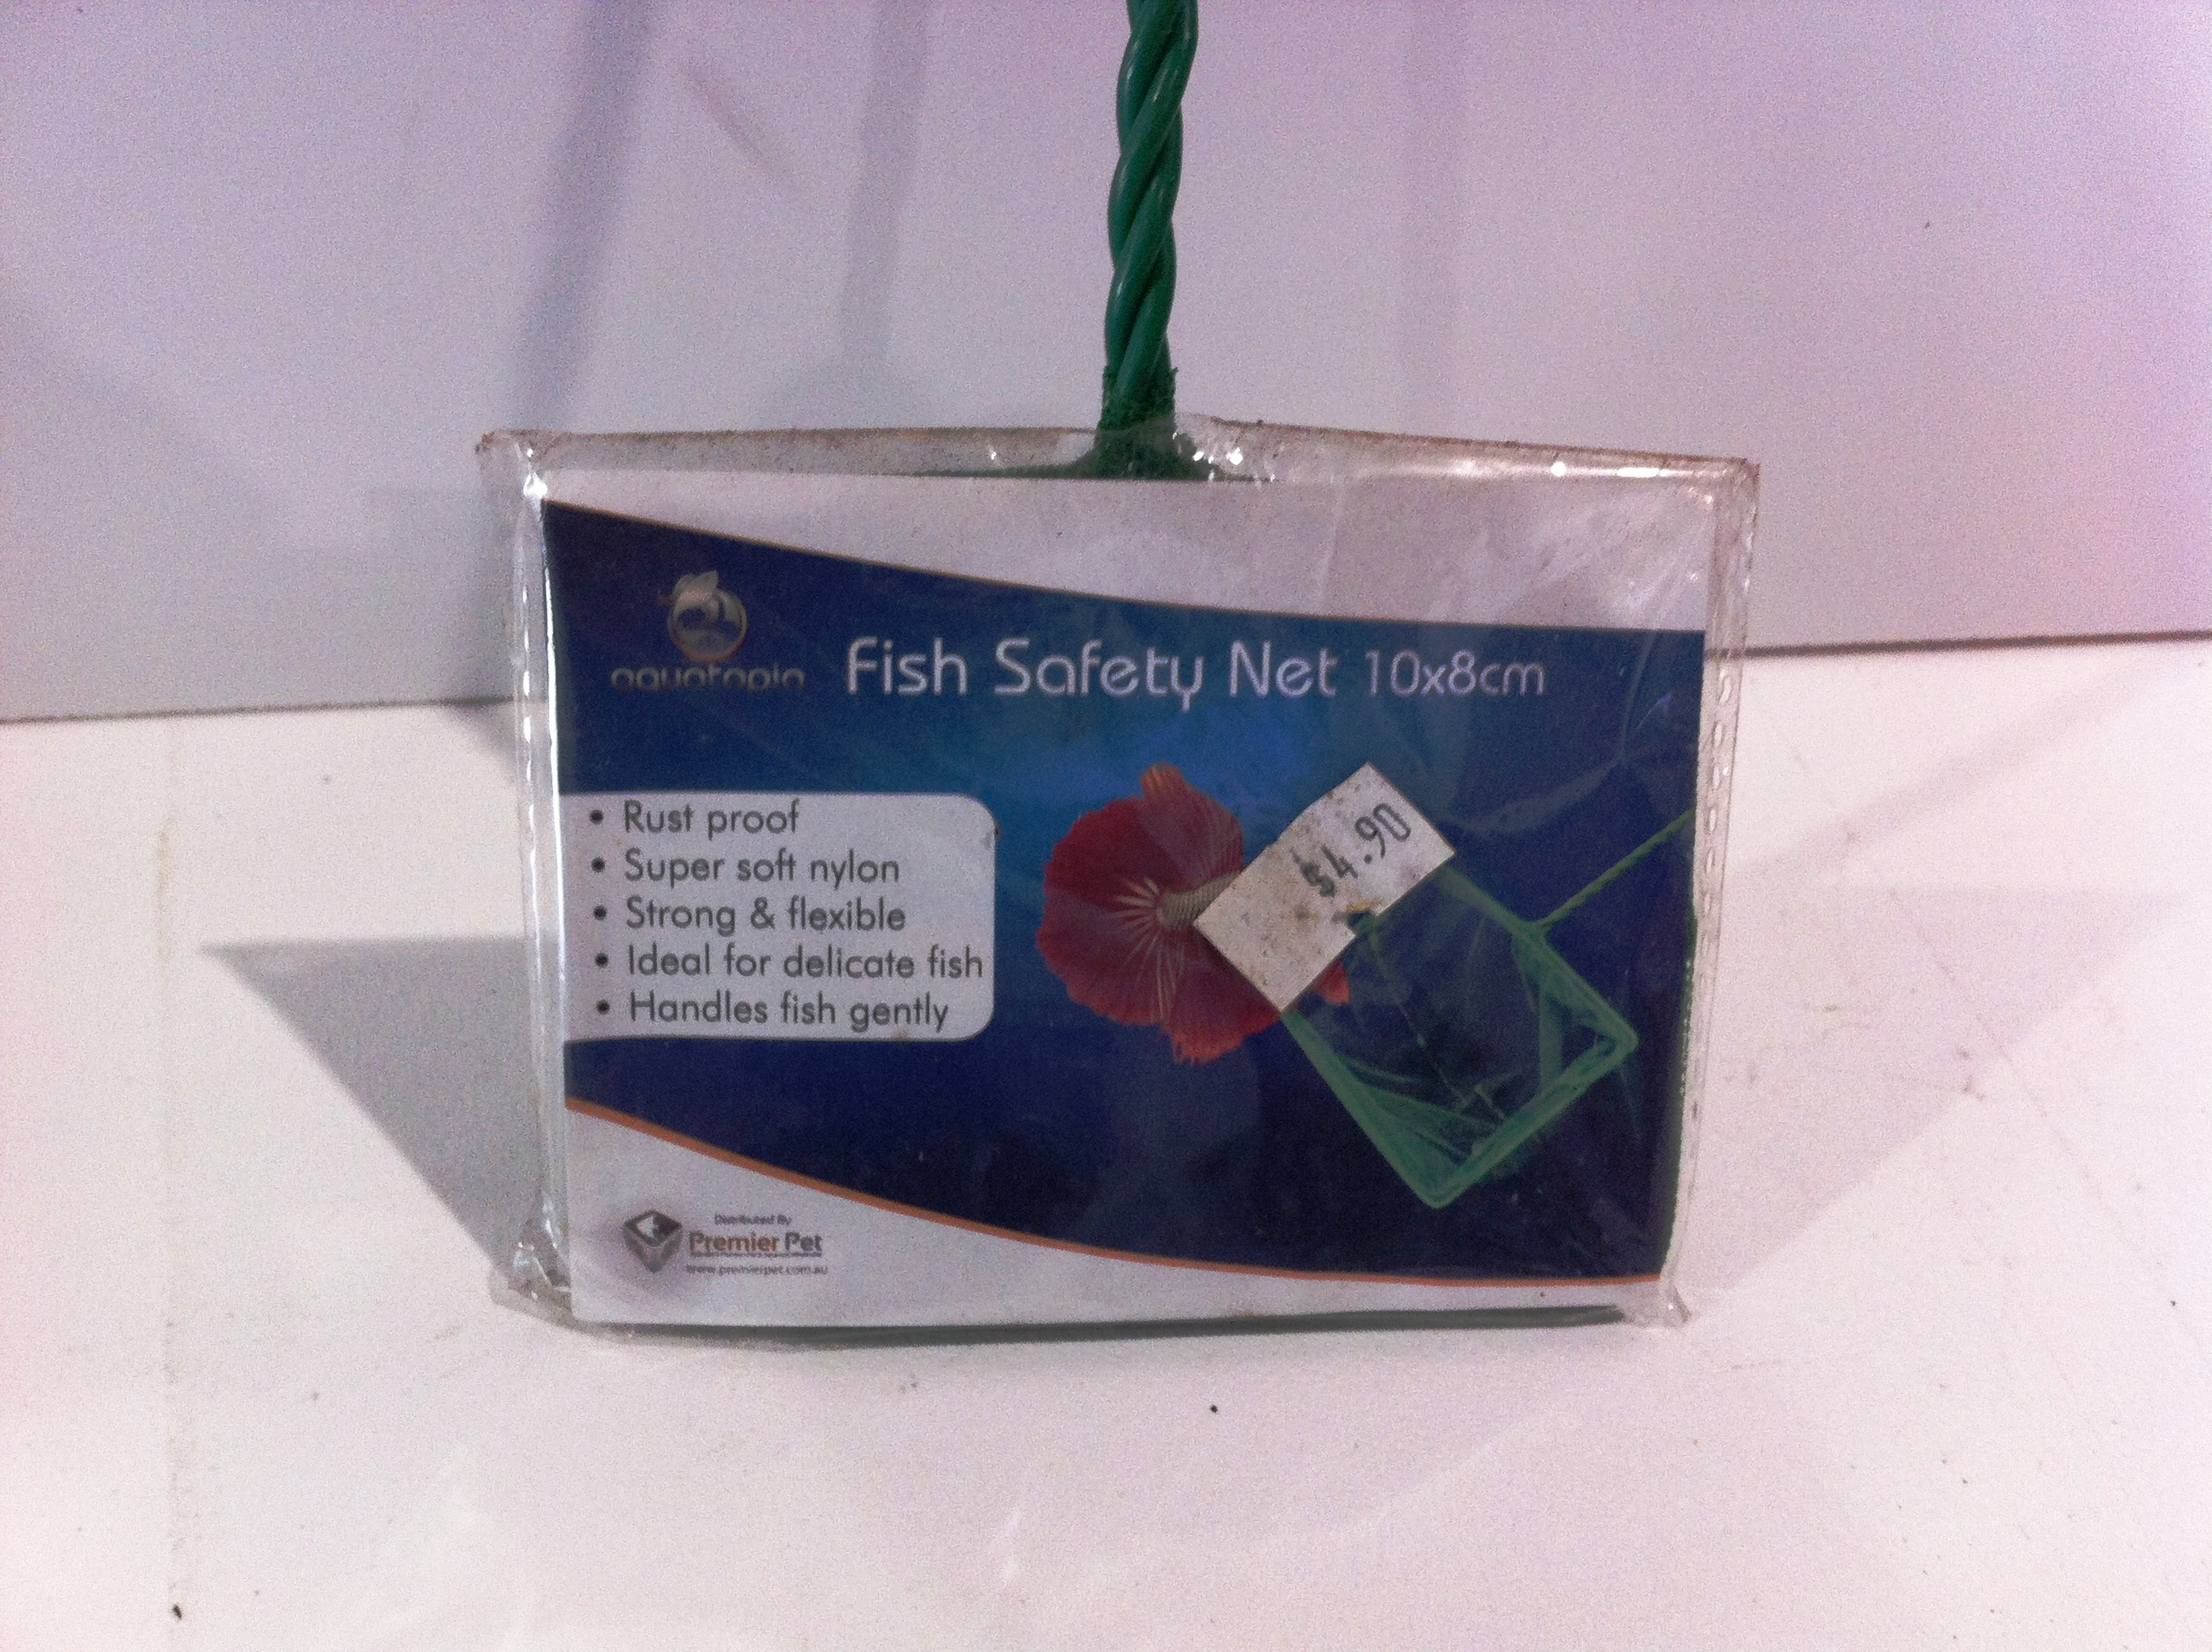 Aquatopia Fish Nets. Pet Supplies Cleaning & Maintenance